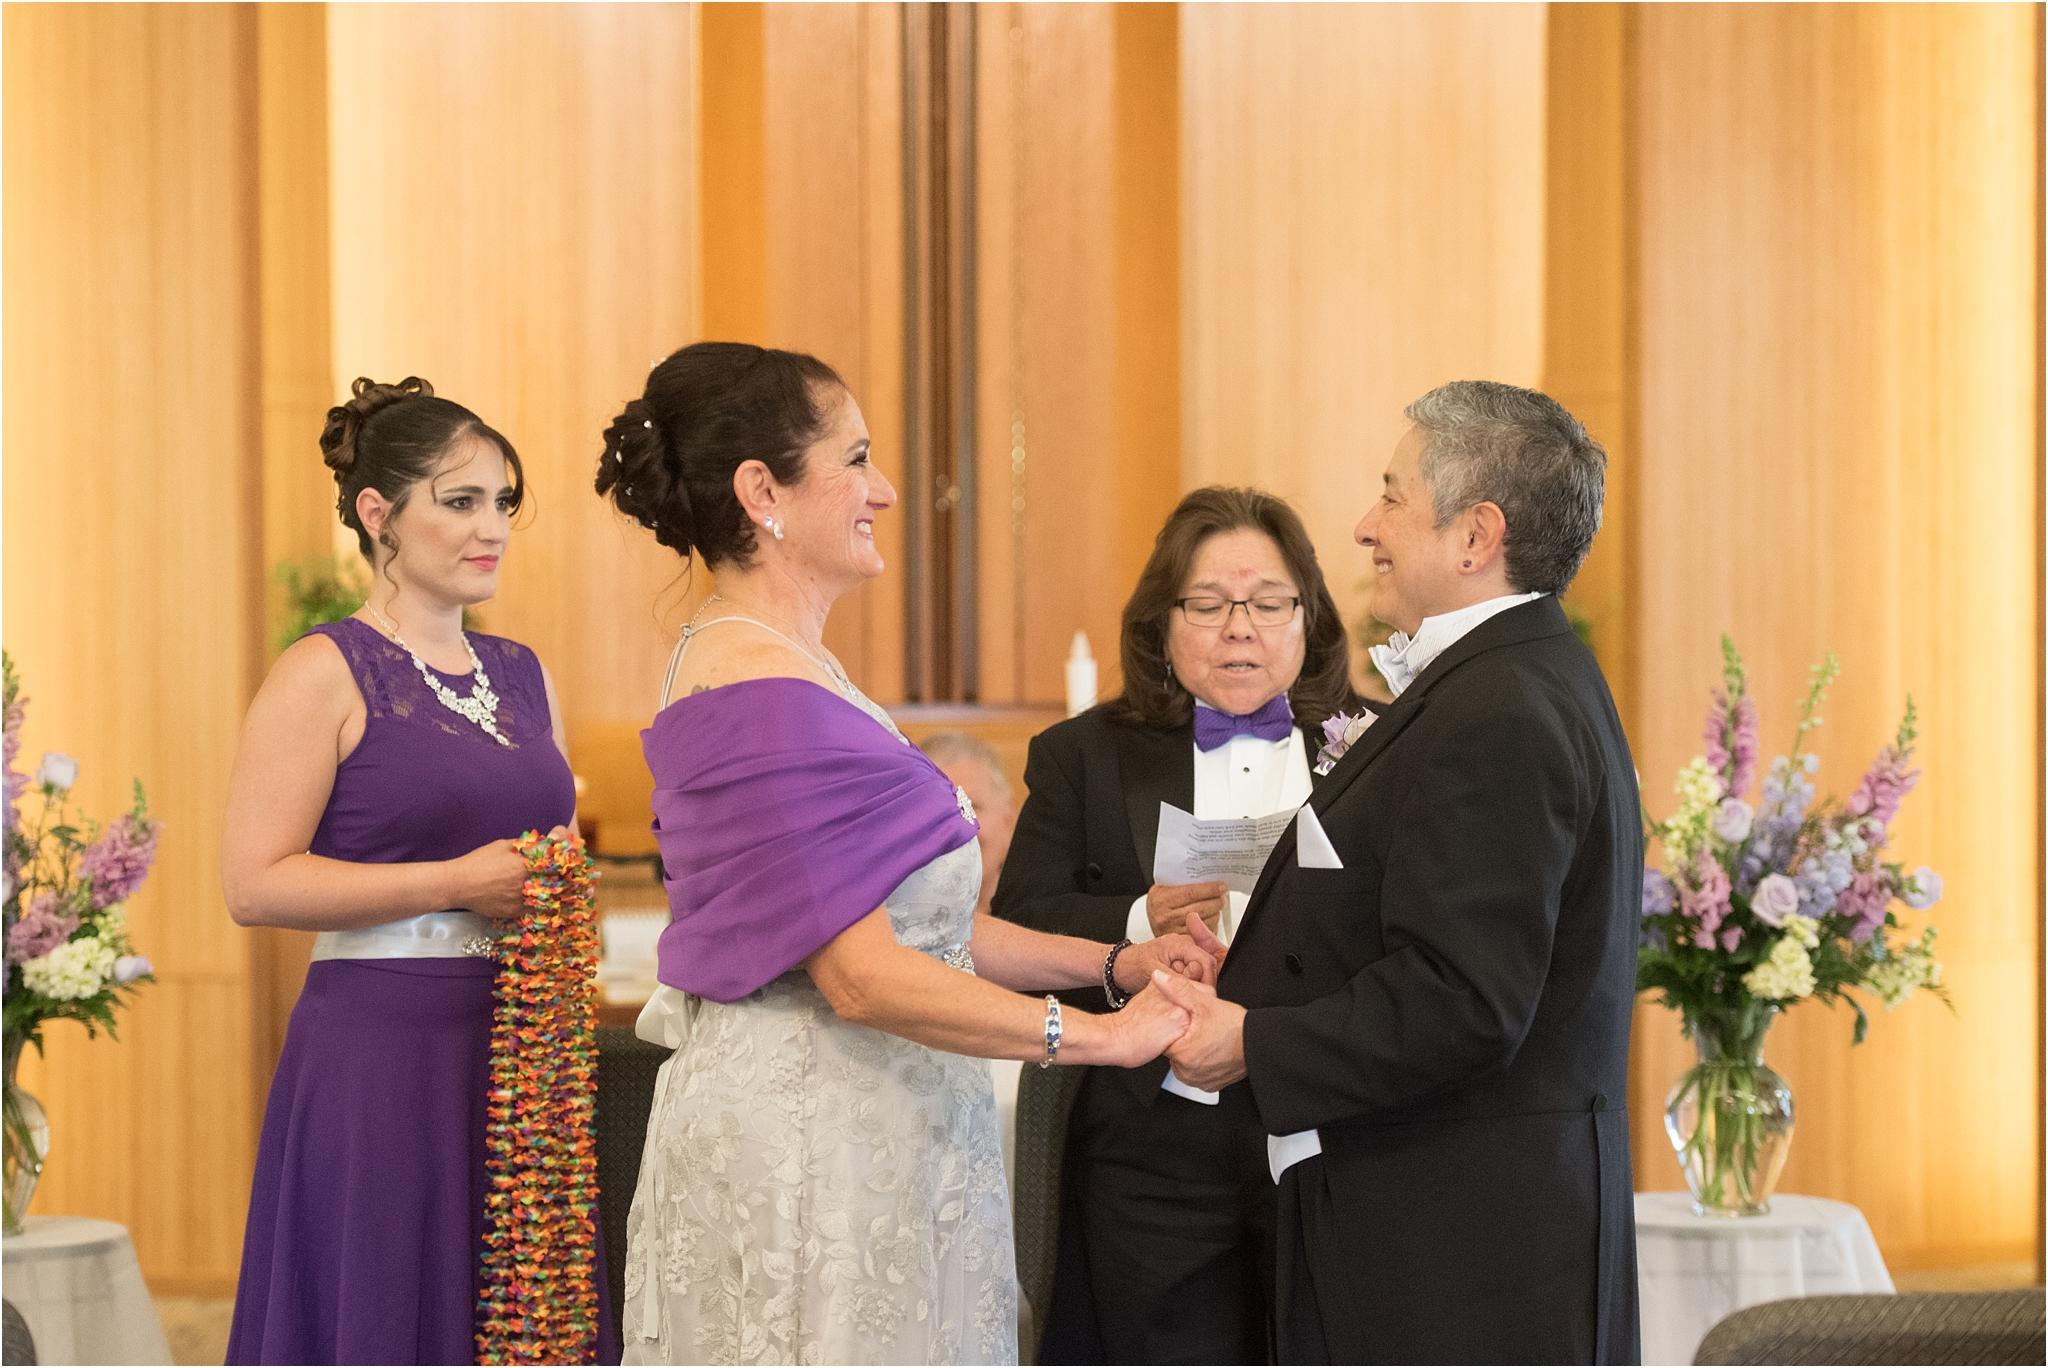 kayla kitts photography - albuquerque wedding photographer - hotel andaluz wedding_0009.jpg